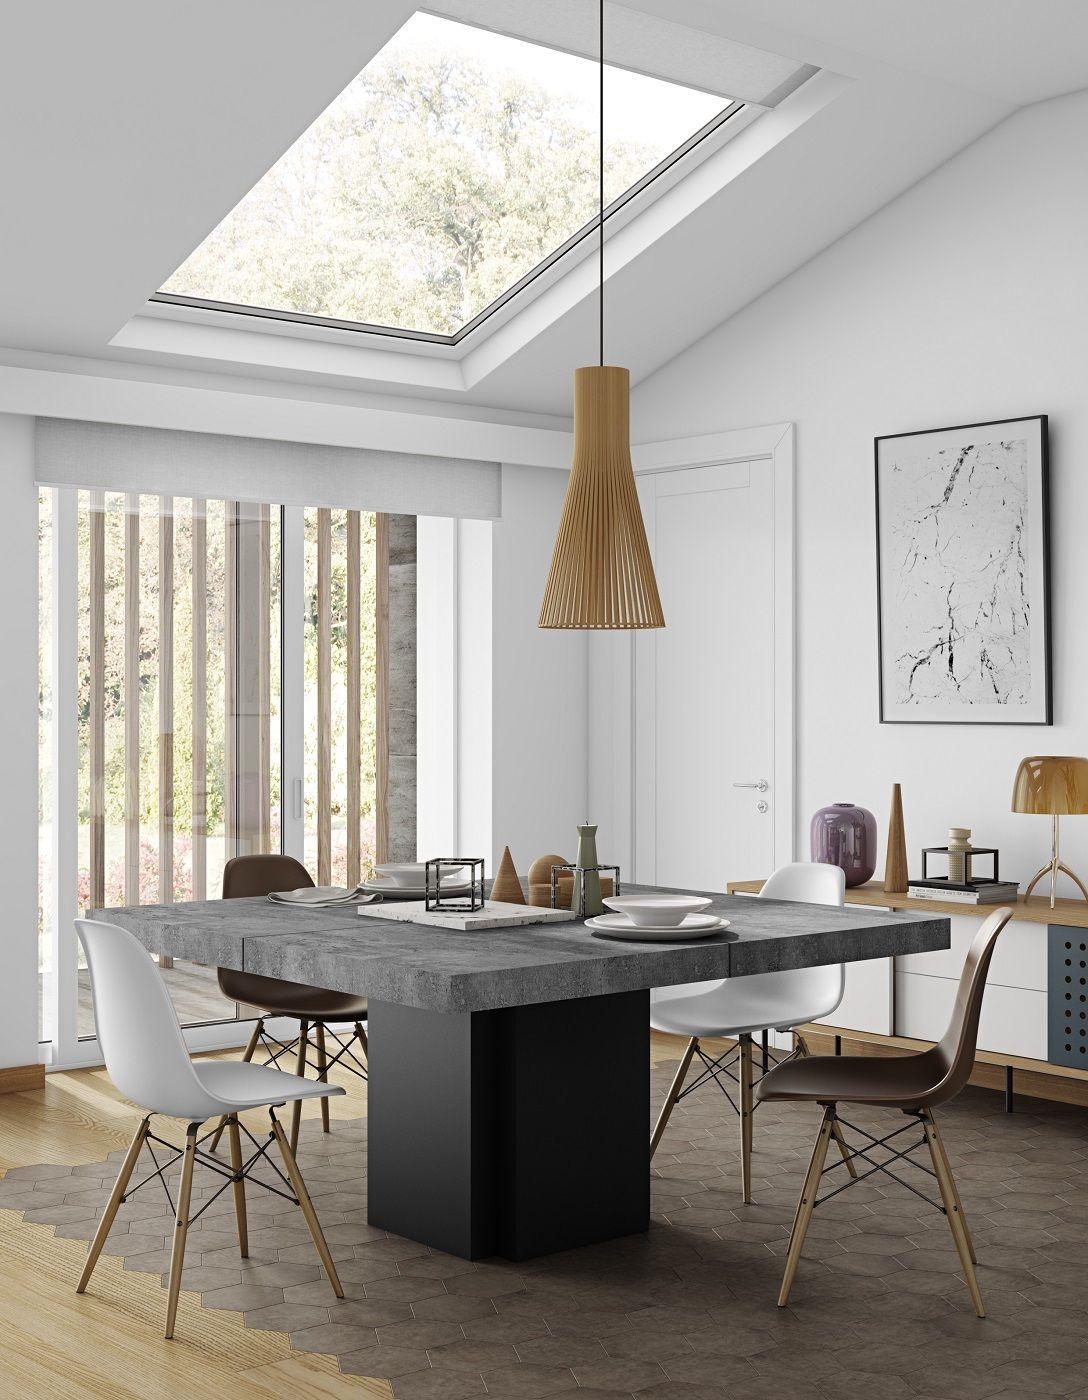 Dusk Spisebord - 150x150 cm - Stilrent spisebord i grå m. central fod